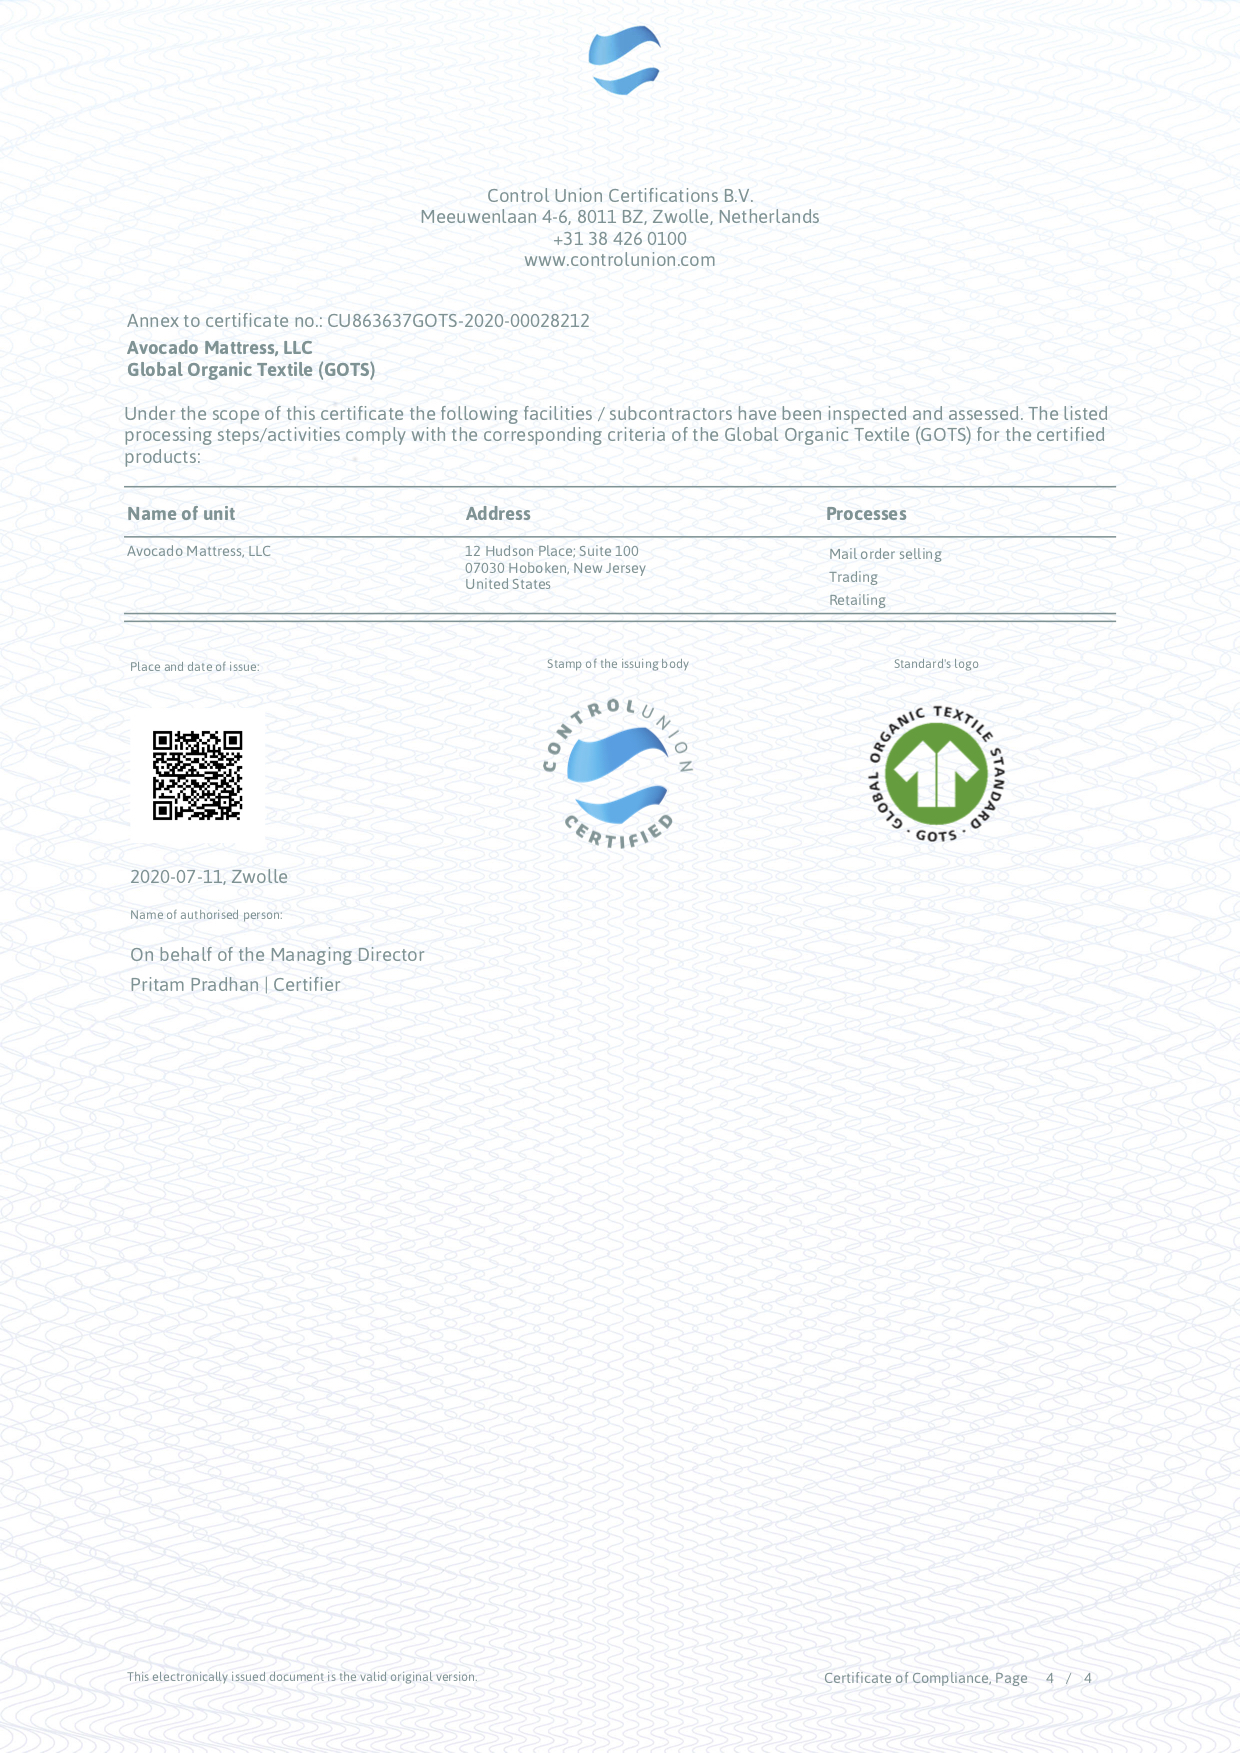 GOTS_Scope_Certificate_2020-07-11_05_29_15_UTC_page_4.jpg